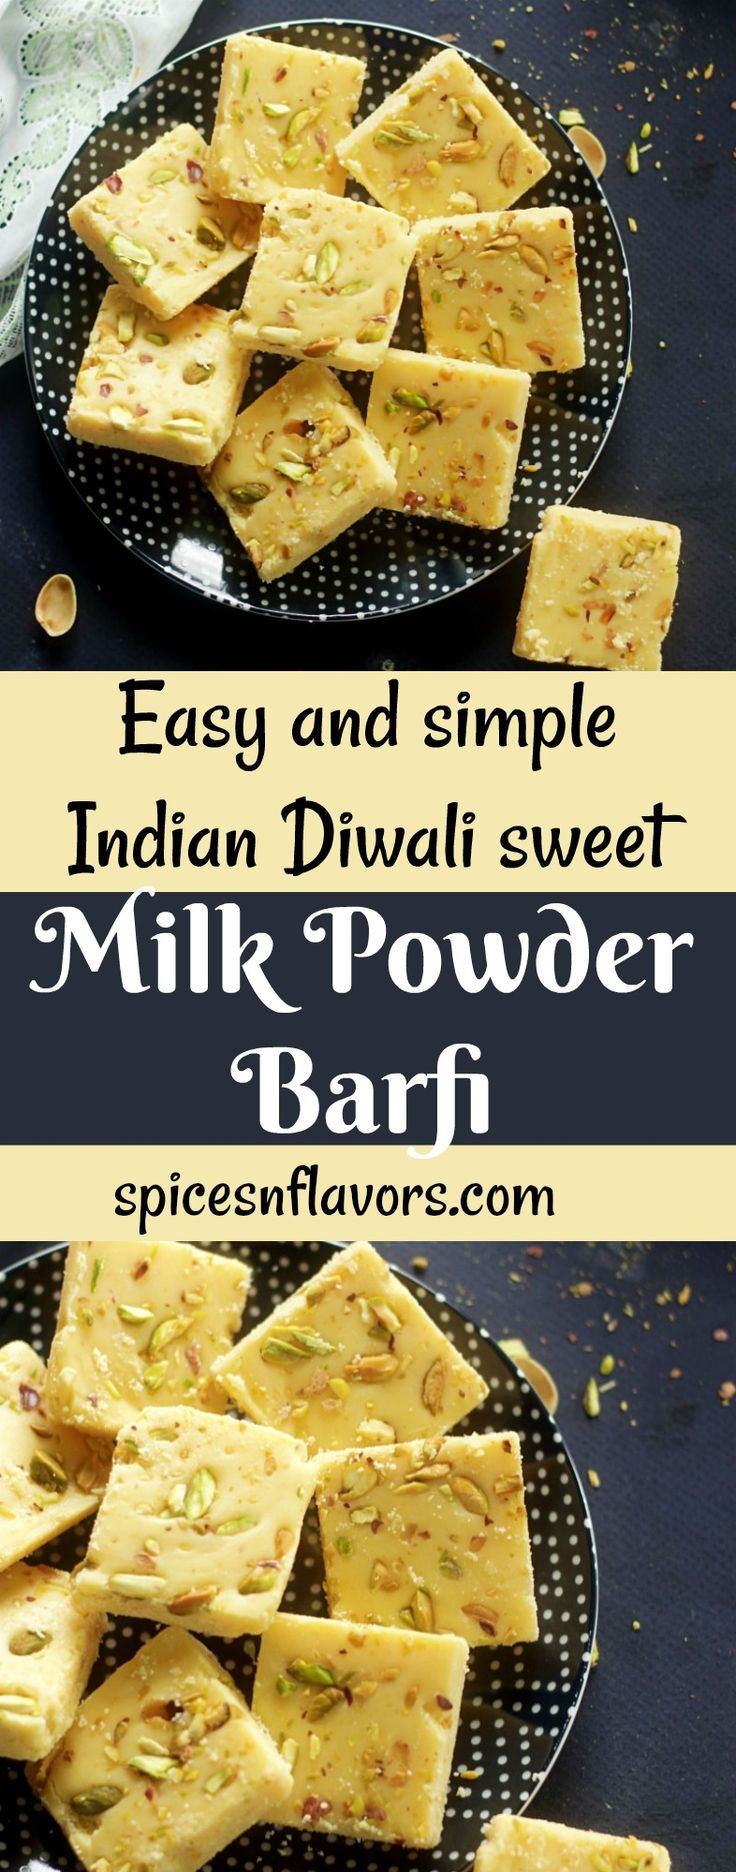 milk powder burfi milk powder barfi #diwali special #indian sweet diwali special indian sweet quick and easy indian sweet indian festival recipe indian sweets diwali recipes easy diwali sweets what to make on diwali beginners recipe 15 mins indian sweet